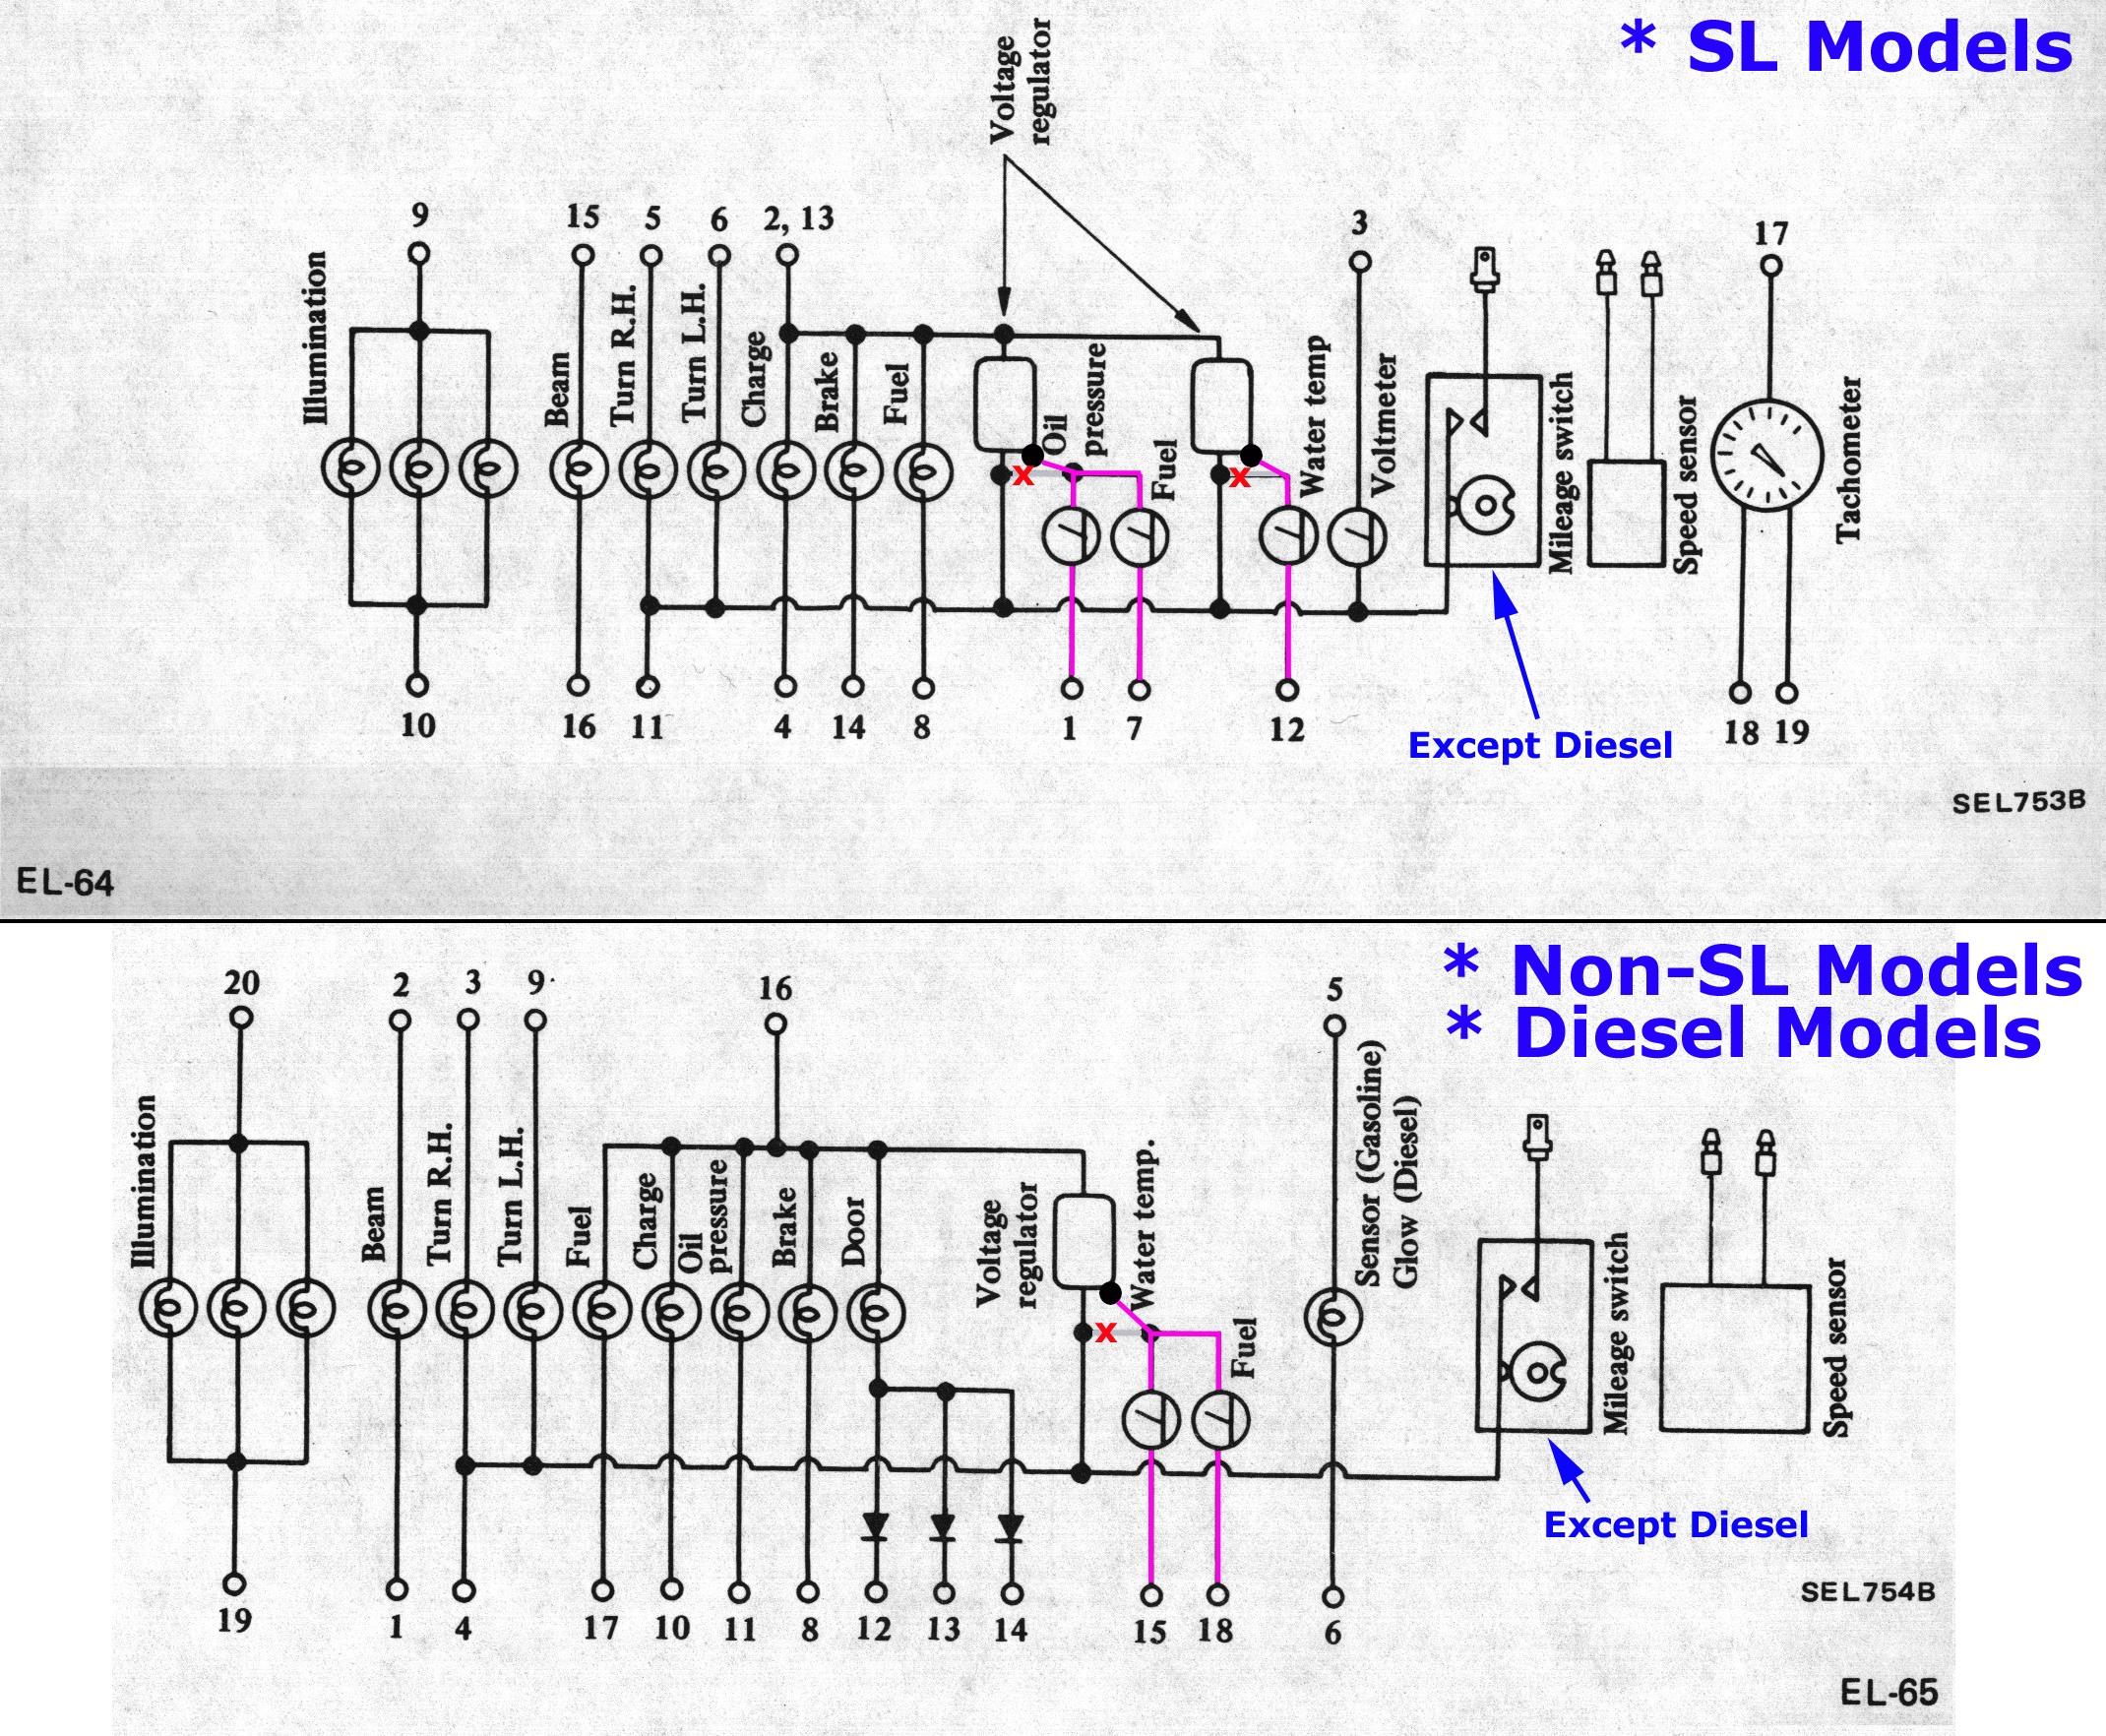 1984s 10 Wiring Diagram - 208 Volt Receptacle Wiring Diagram -  viking.tukune.jeanjaures37.frWiring Diagram Resource